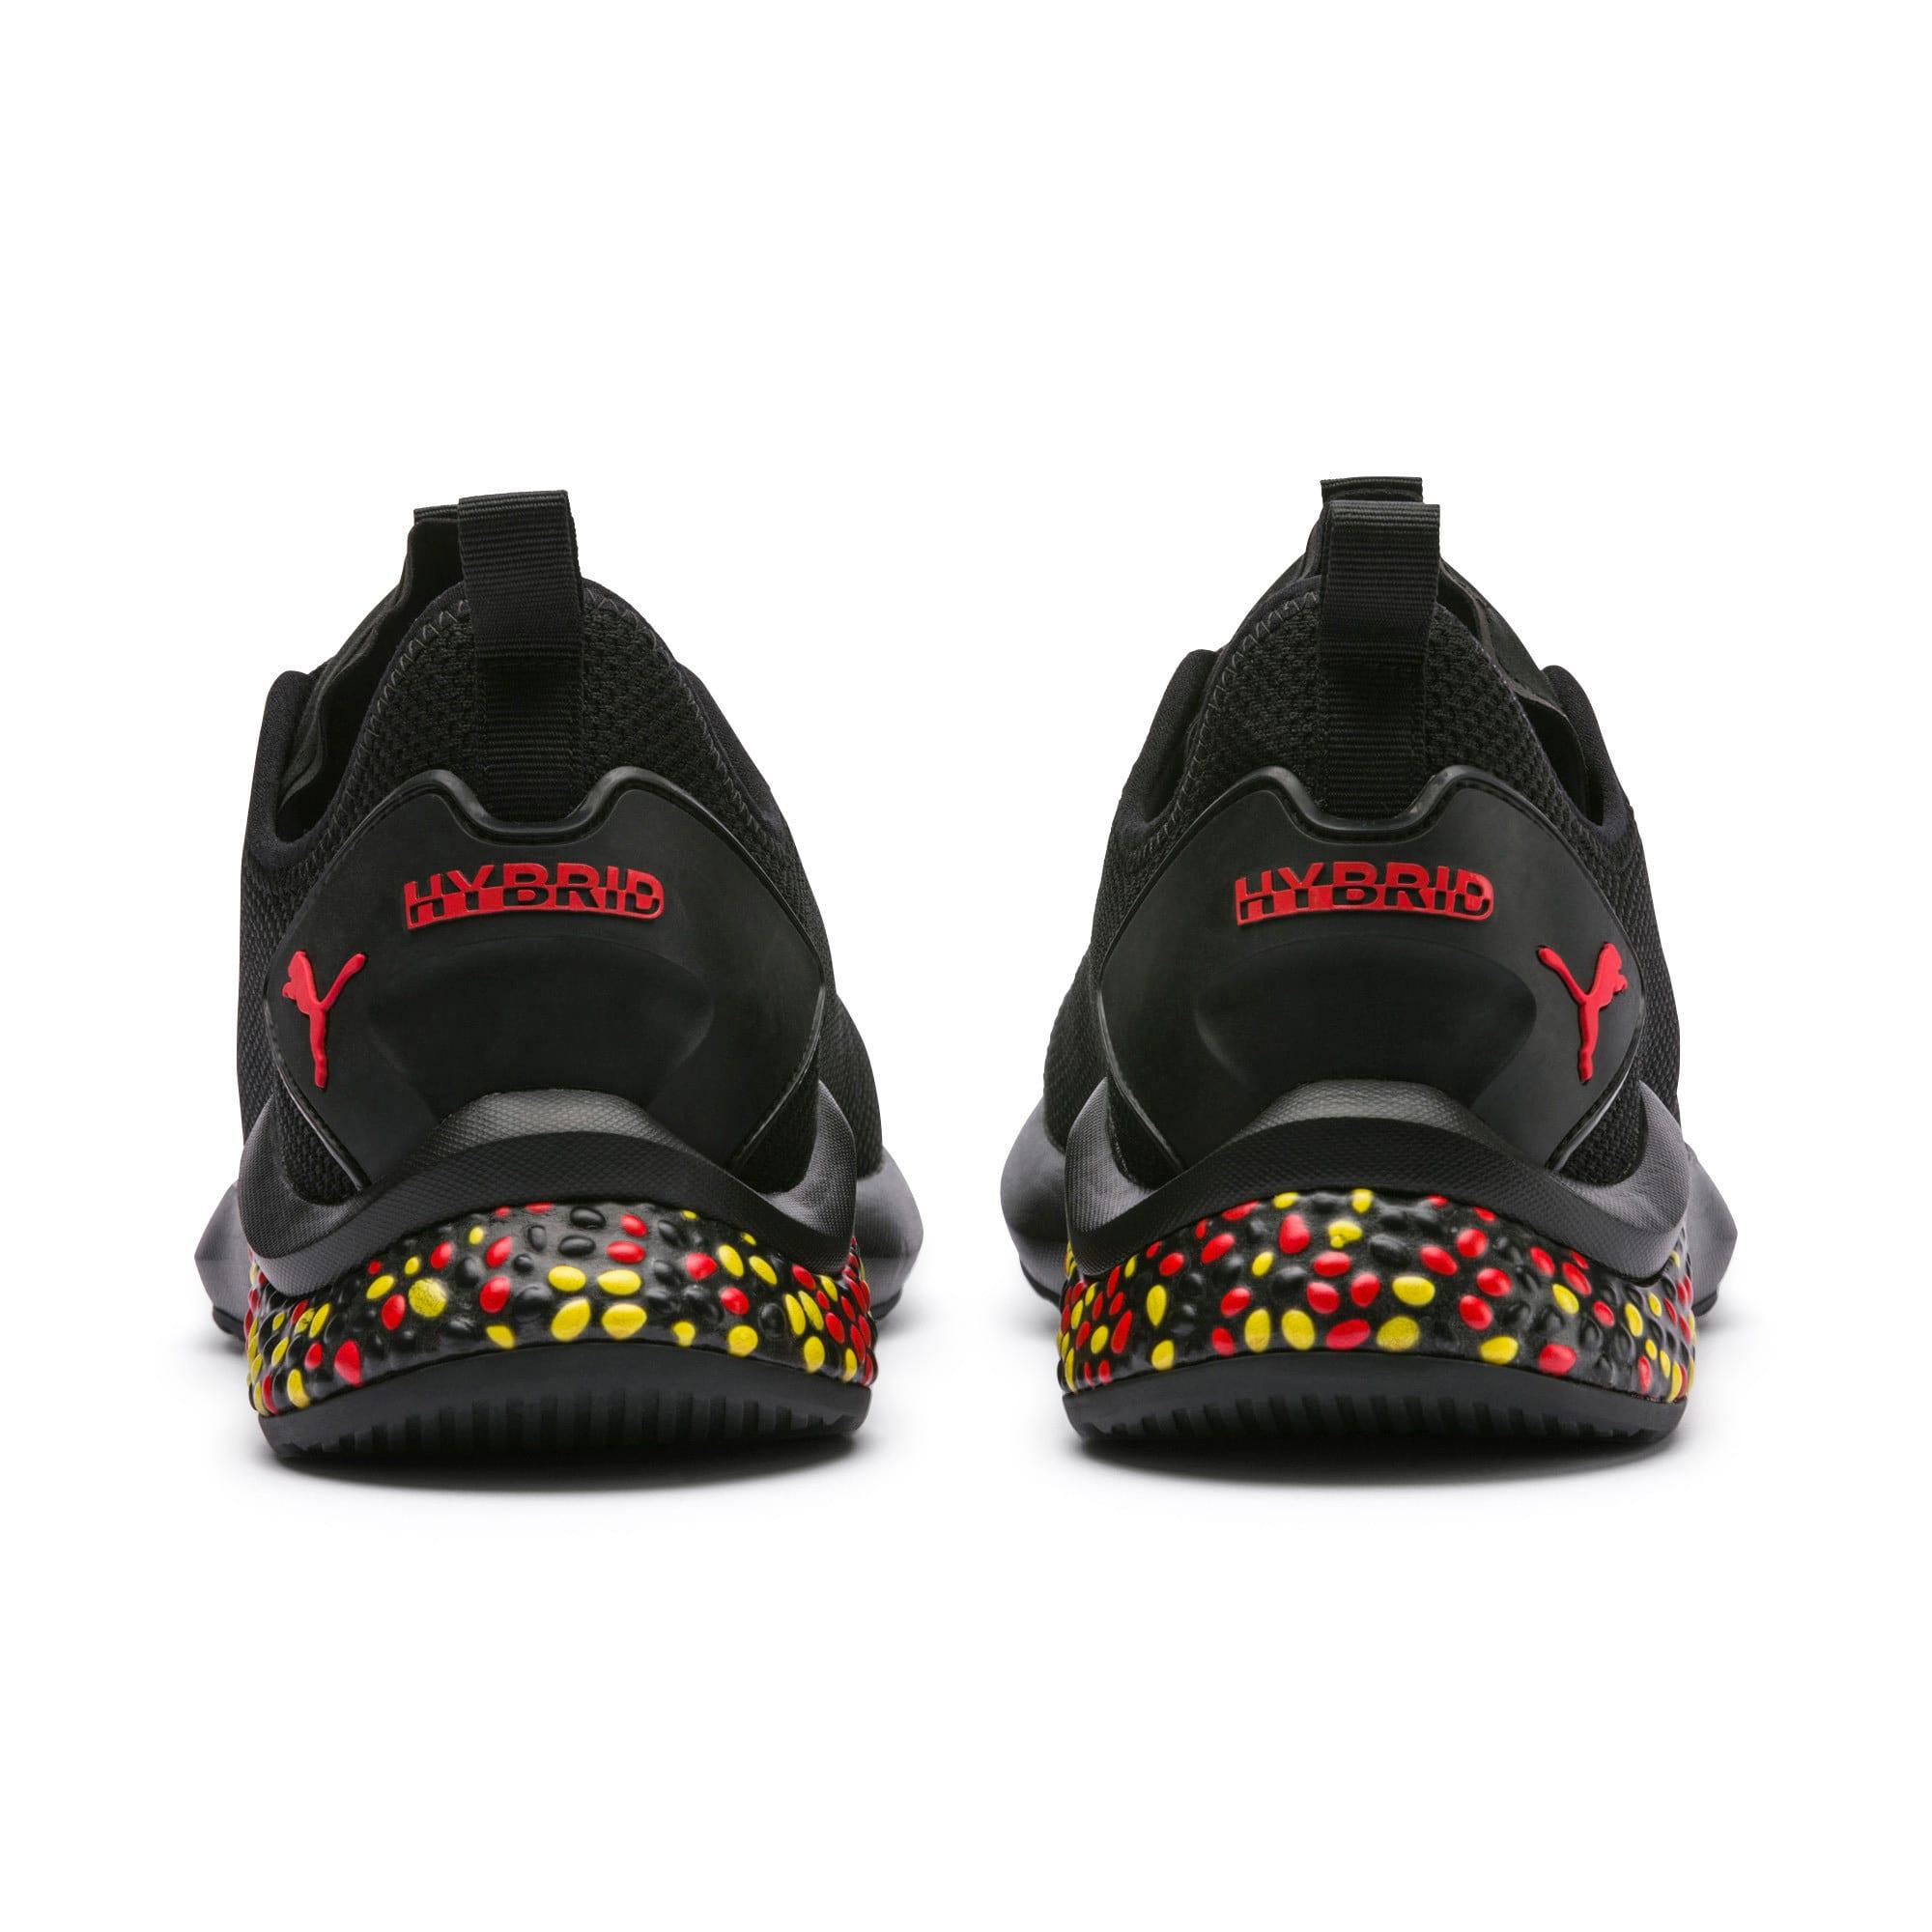 Thumbnail 3 of HYBRID NX Men's Running Shoes, Black-Red-Yellow, medium